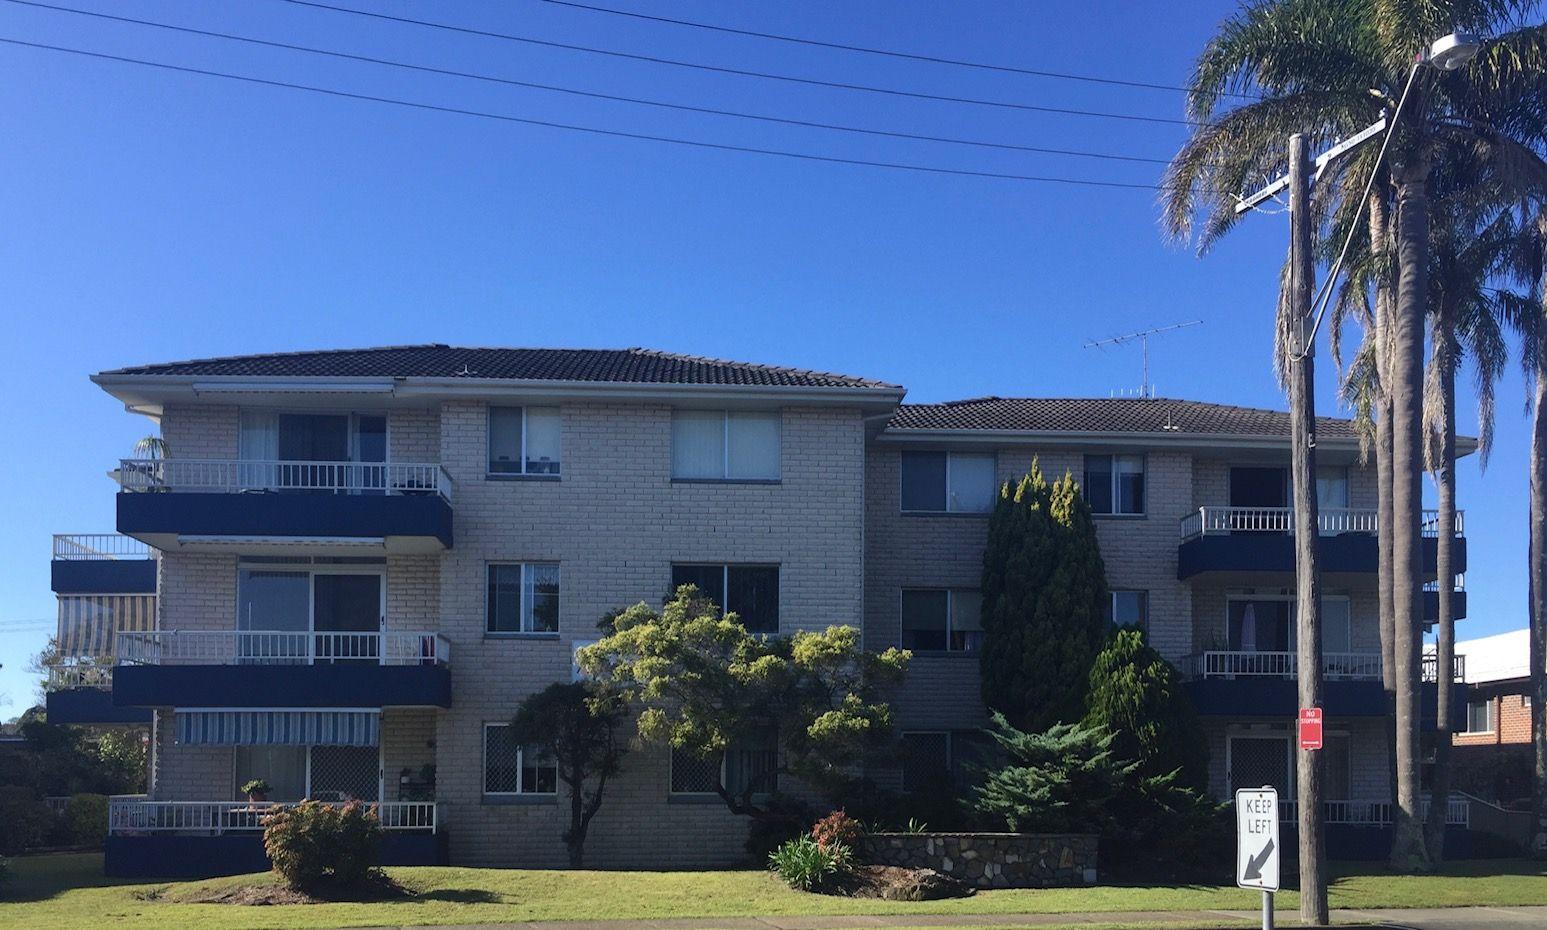 15/106 Little Street, Forster NSW 2428, Image 0